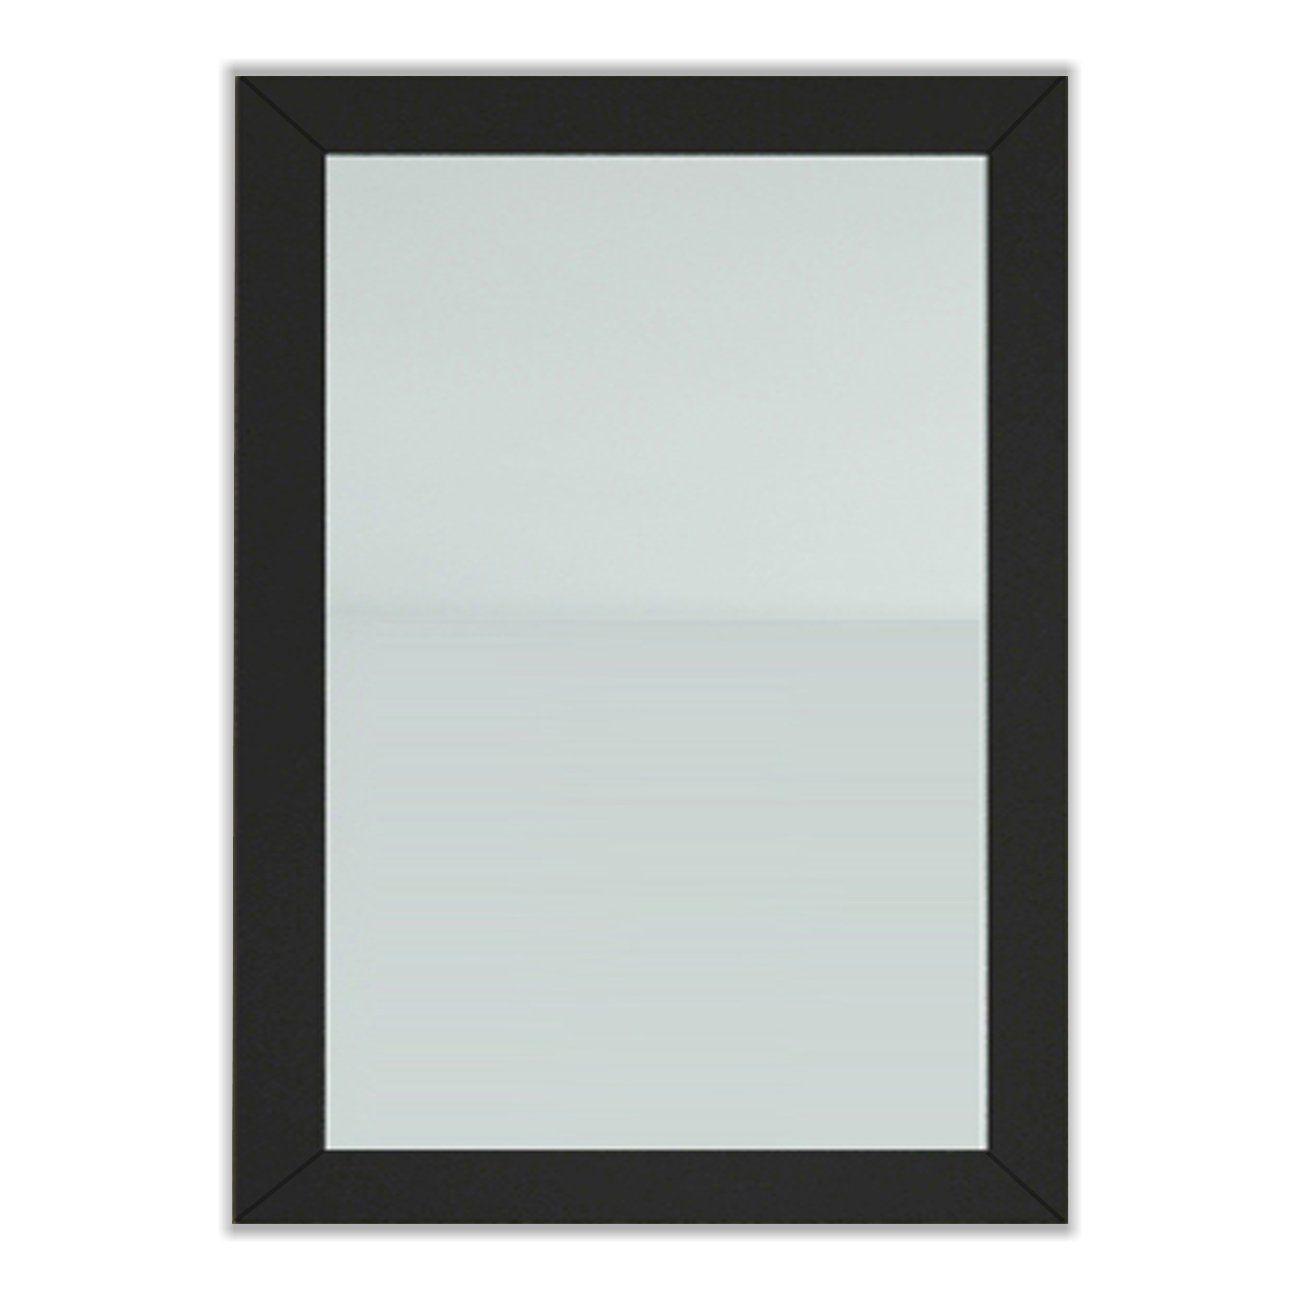 JWH Living Bathroom Mirror with Solid Wood Frame. Dimensions: 24W x ...